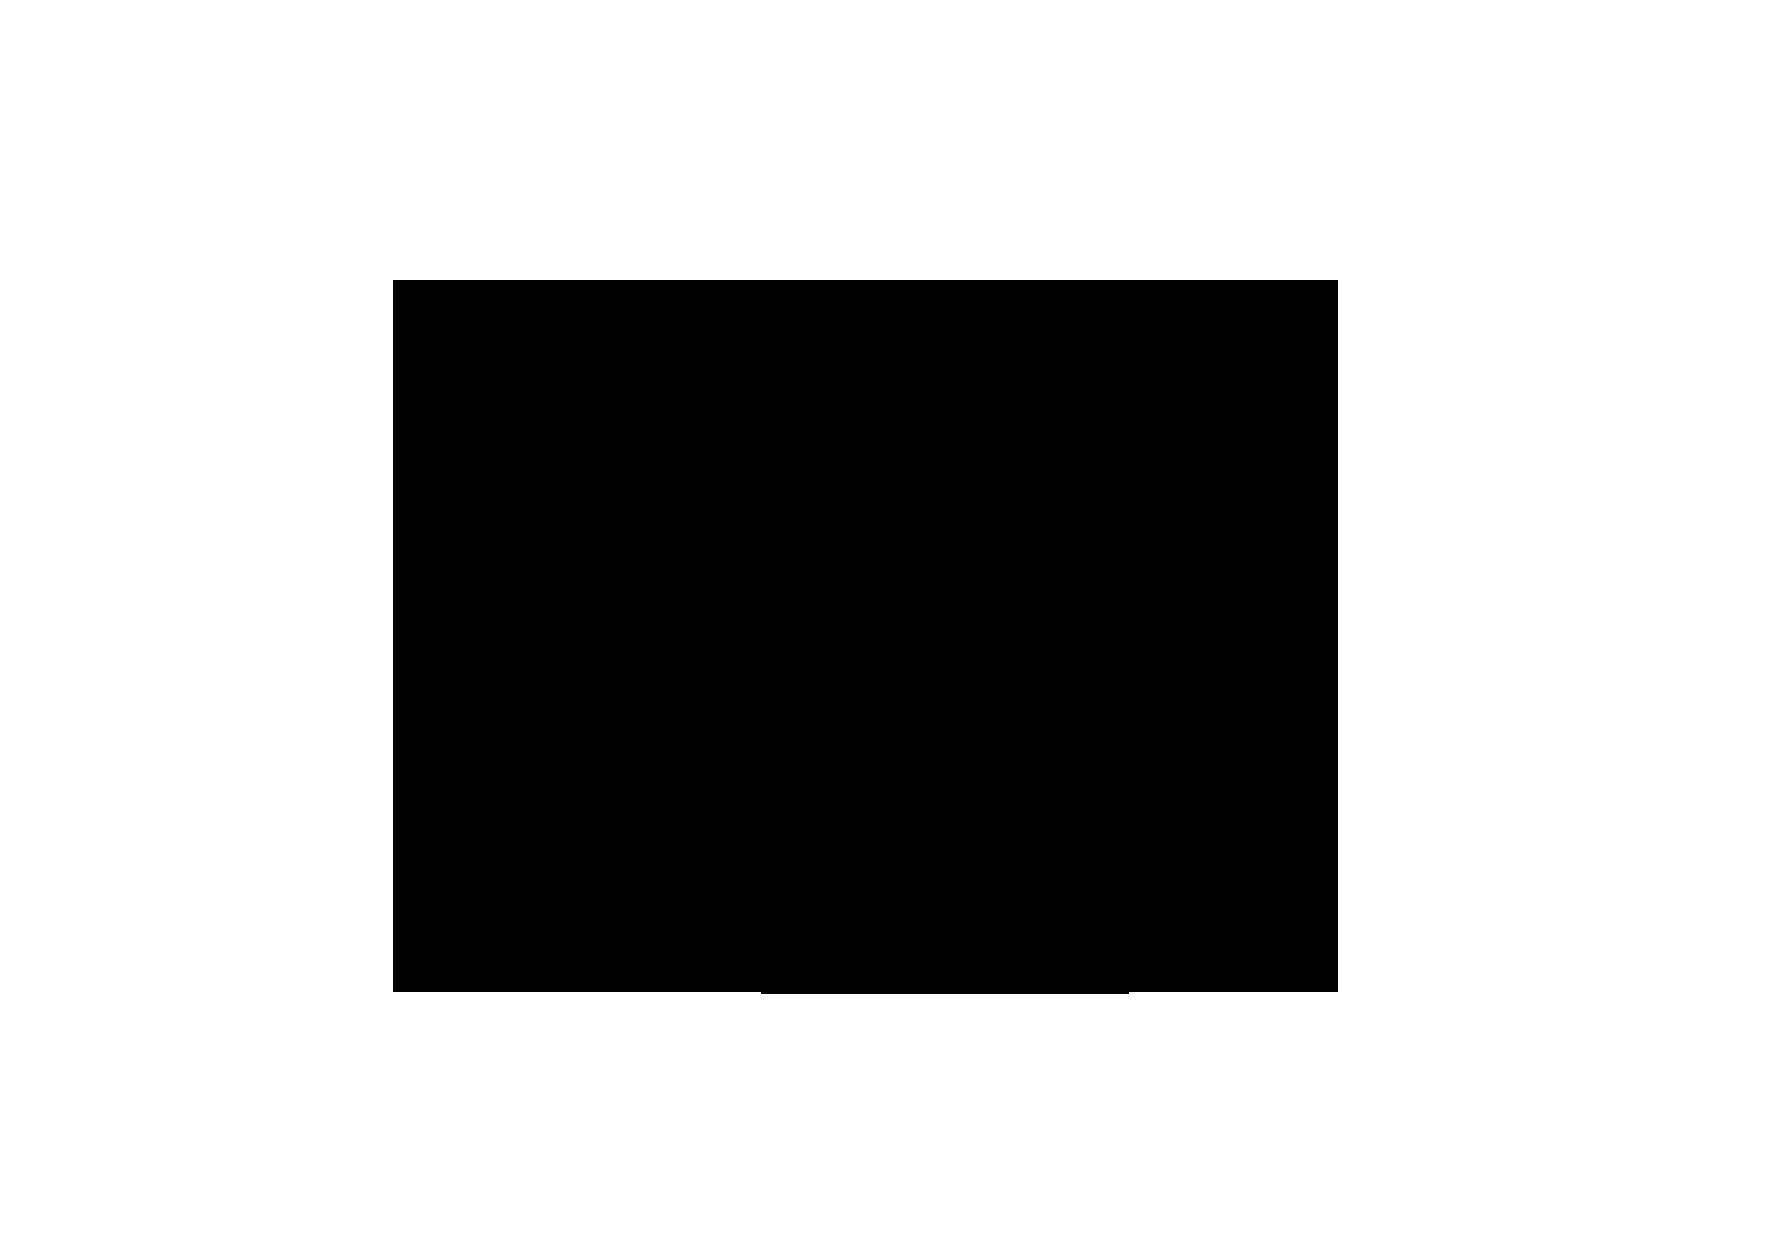 مخطوطه رمضان كريم مفرغه 10 15 مخطوطه لشهر رمضان بالخط الحر png